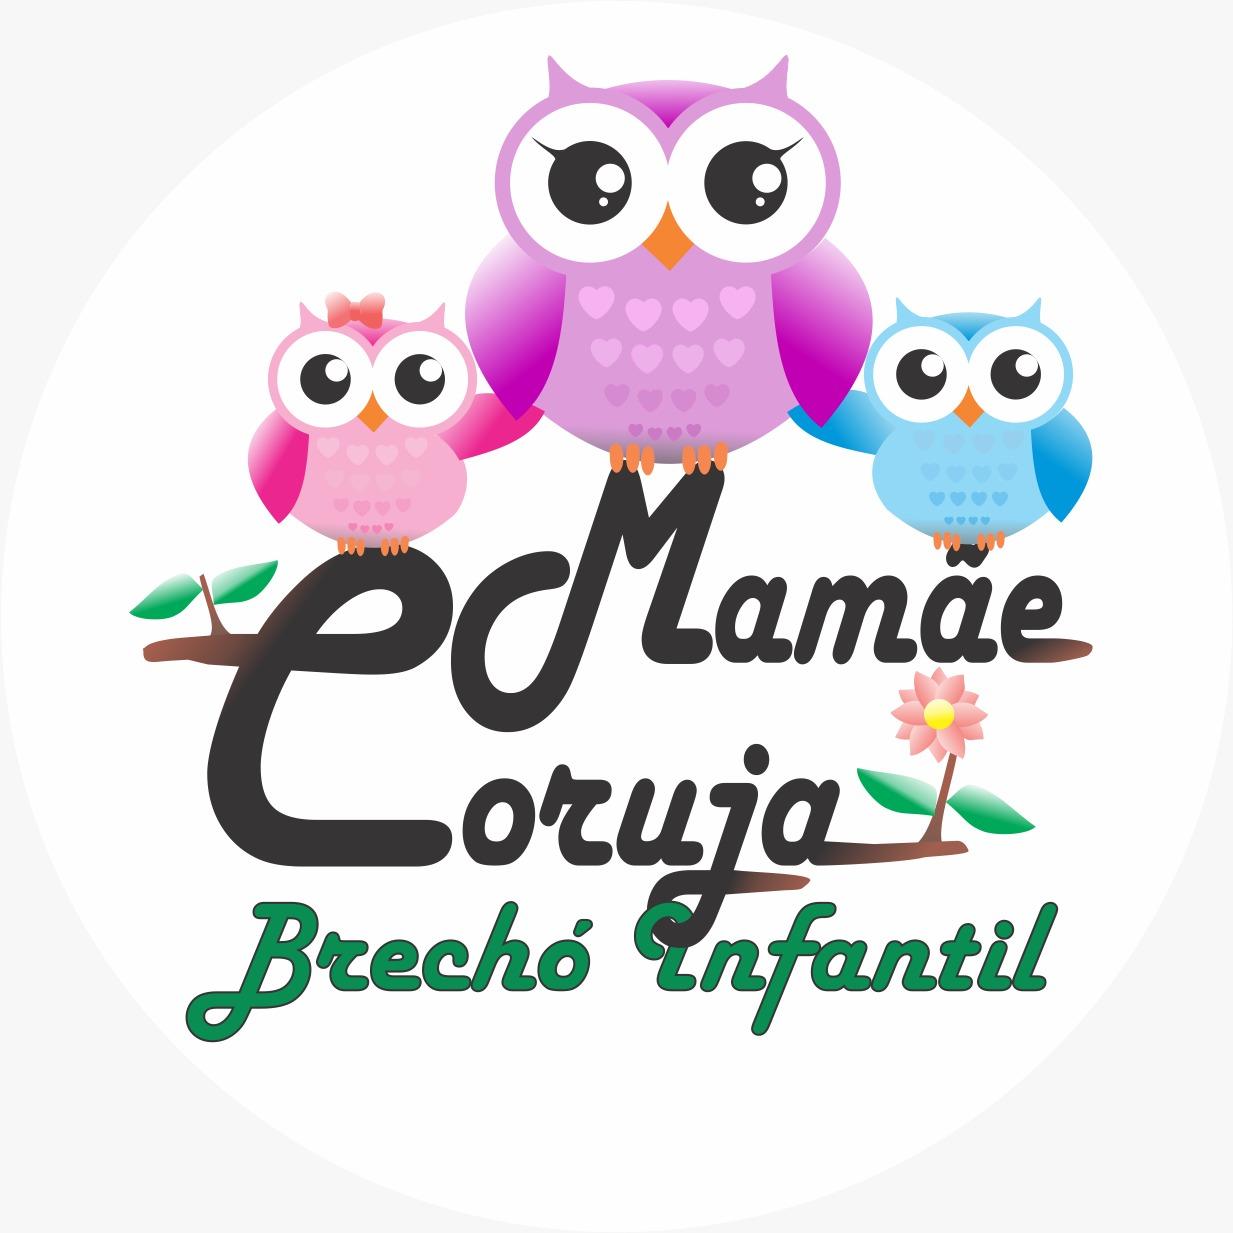 Mamãe Coruja Brechó Infantil